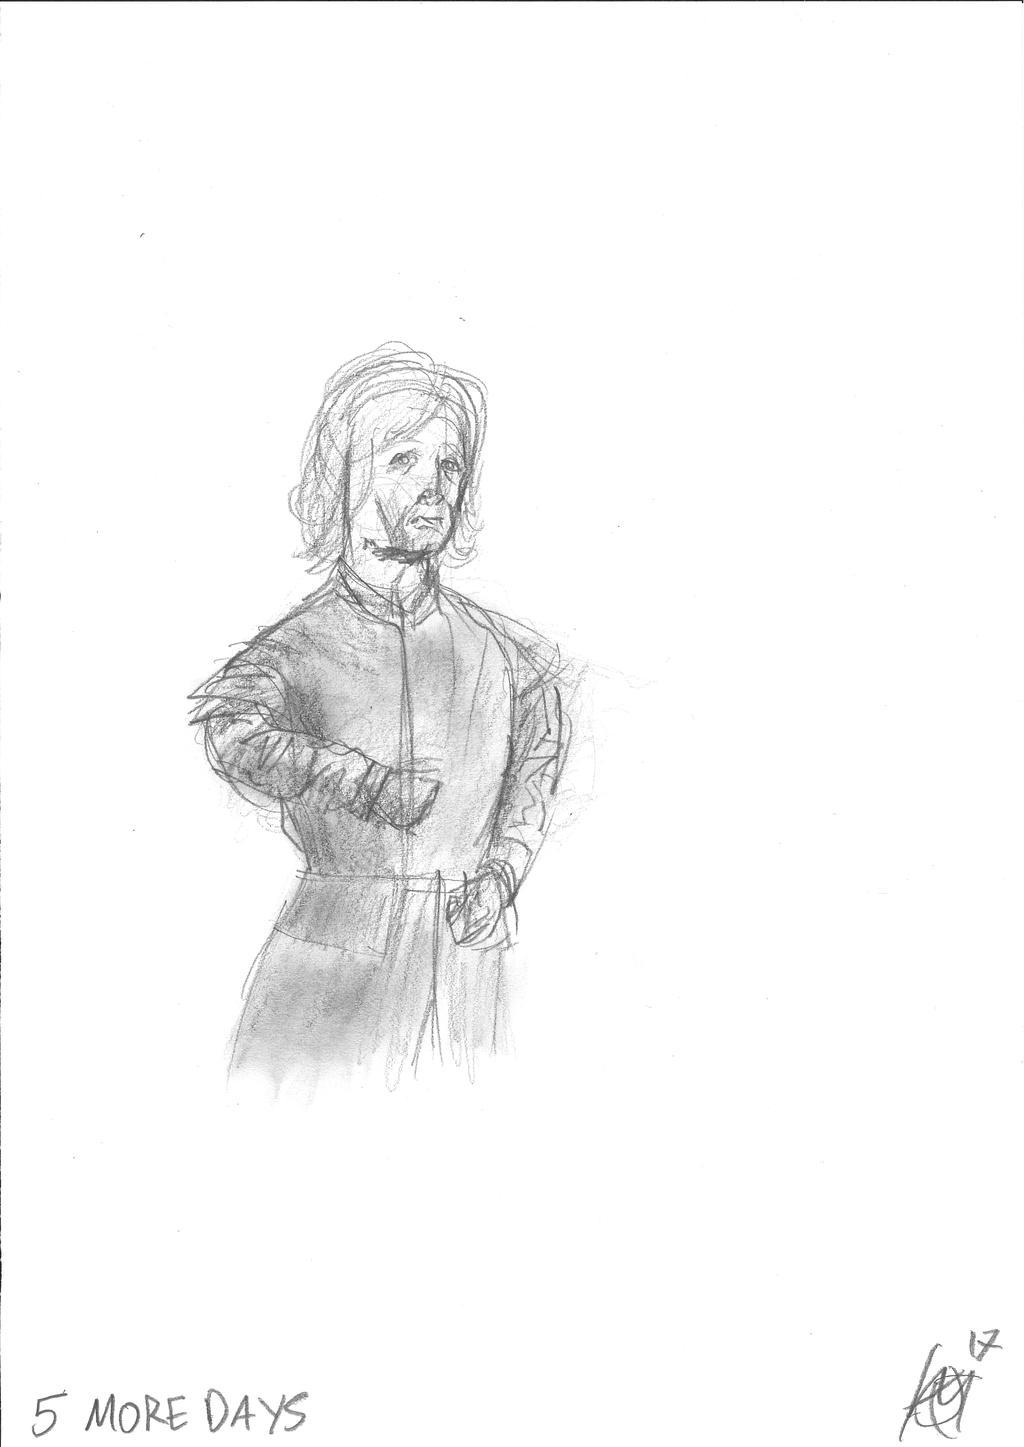 Season 2 - Tyrion Lannister by JMK-Prime